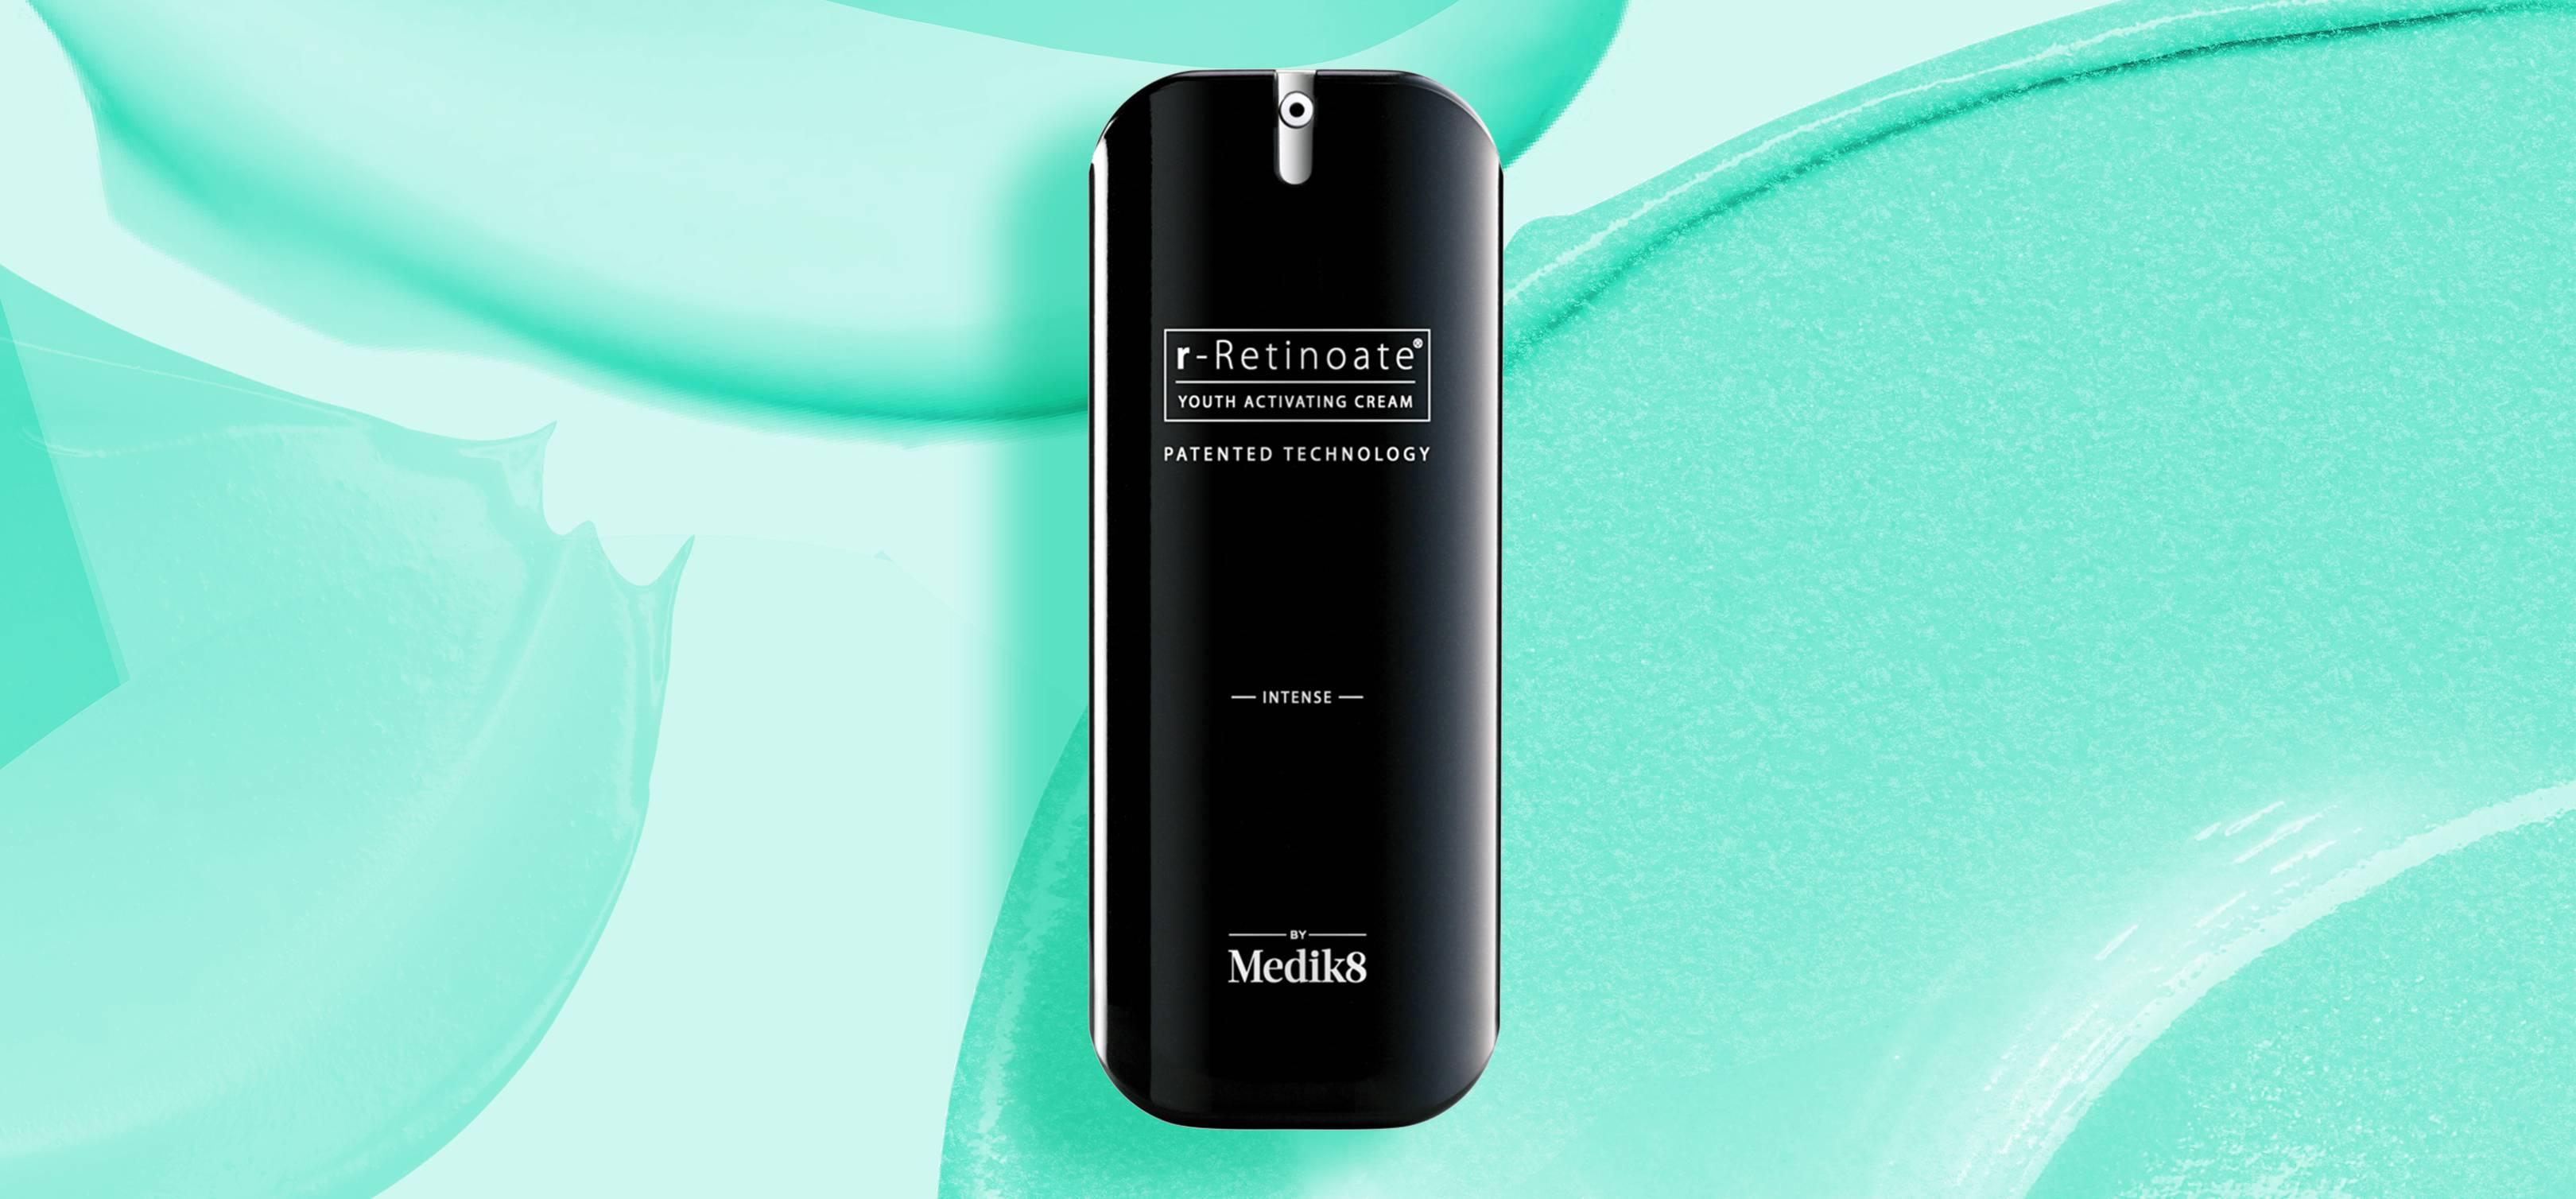 Medik8 r-Retinoate Intense Review | Glamour UK